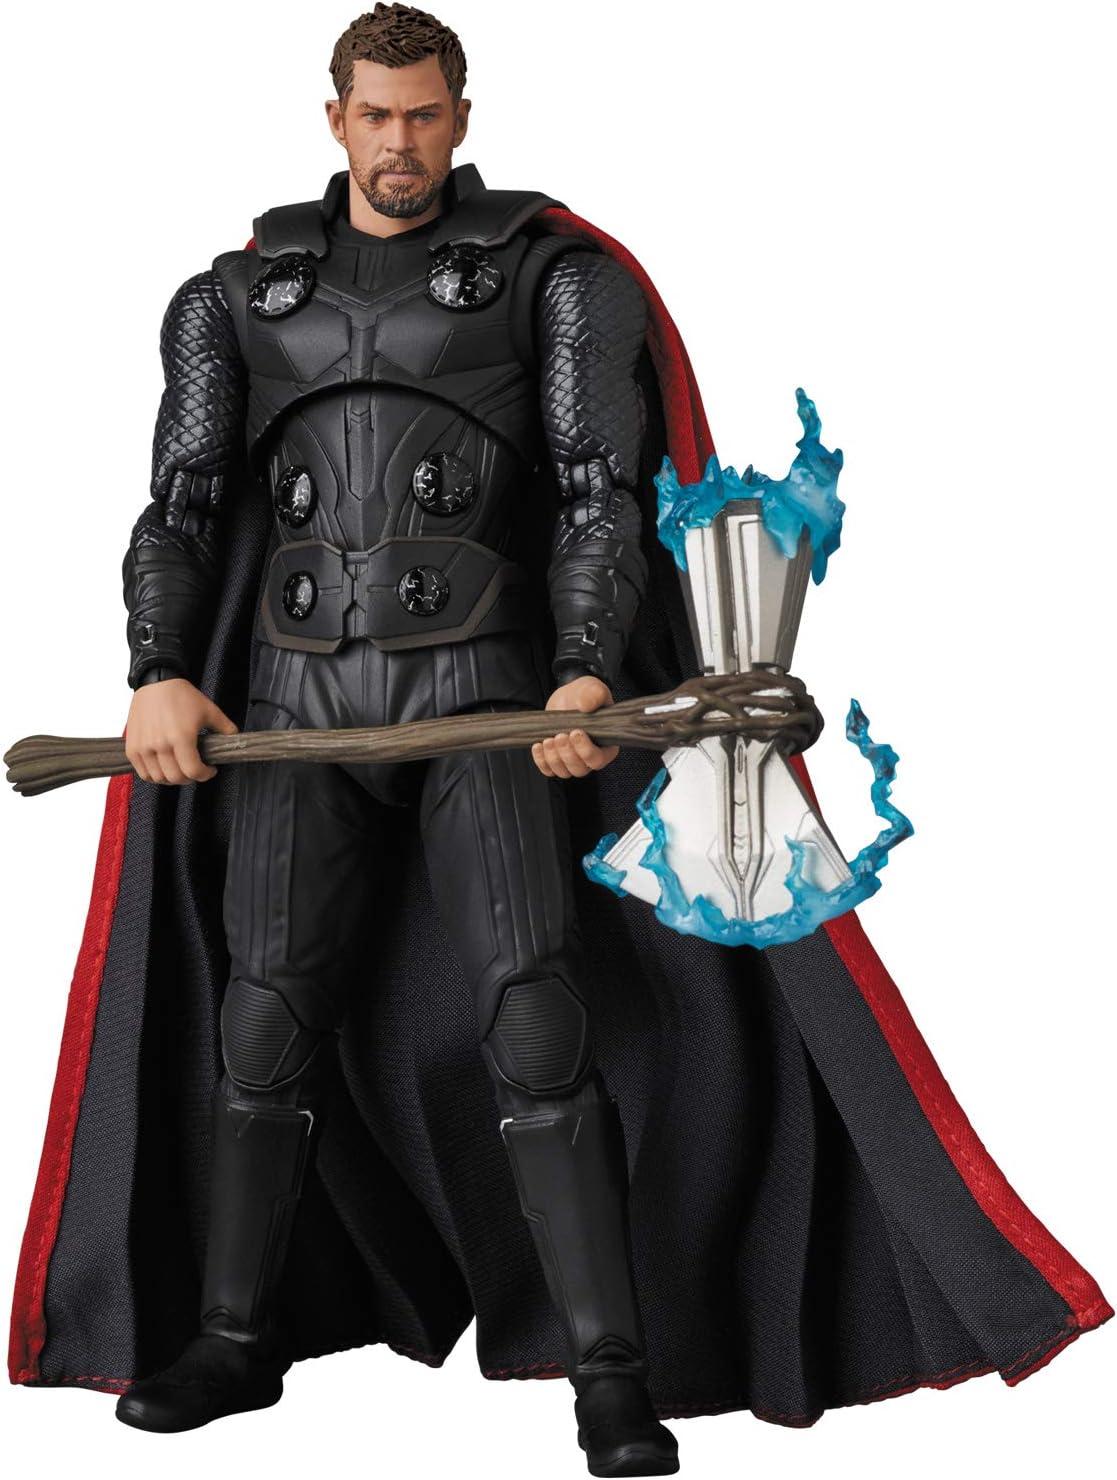 MAFEX Thor Avengers Infinity War US Seller